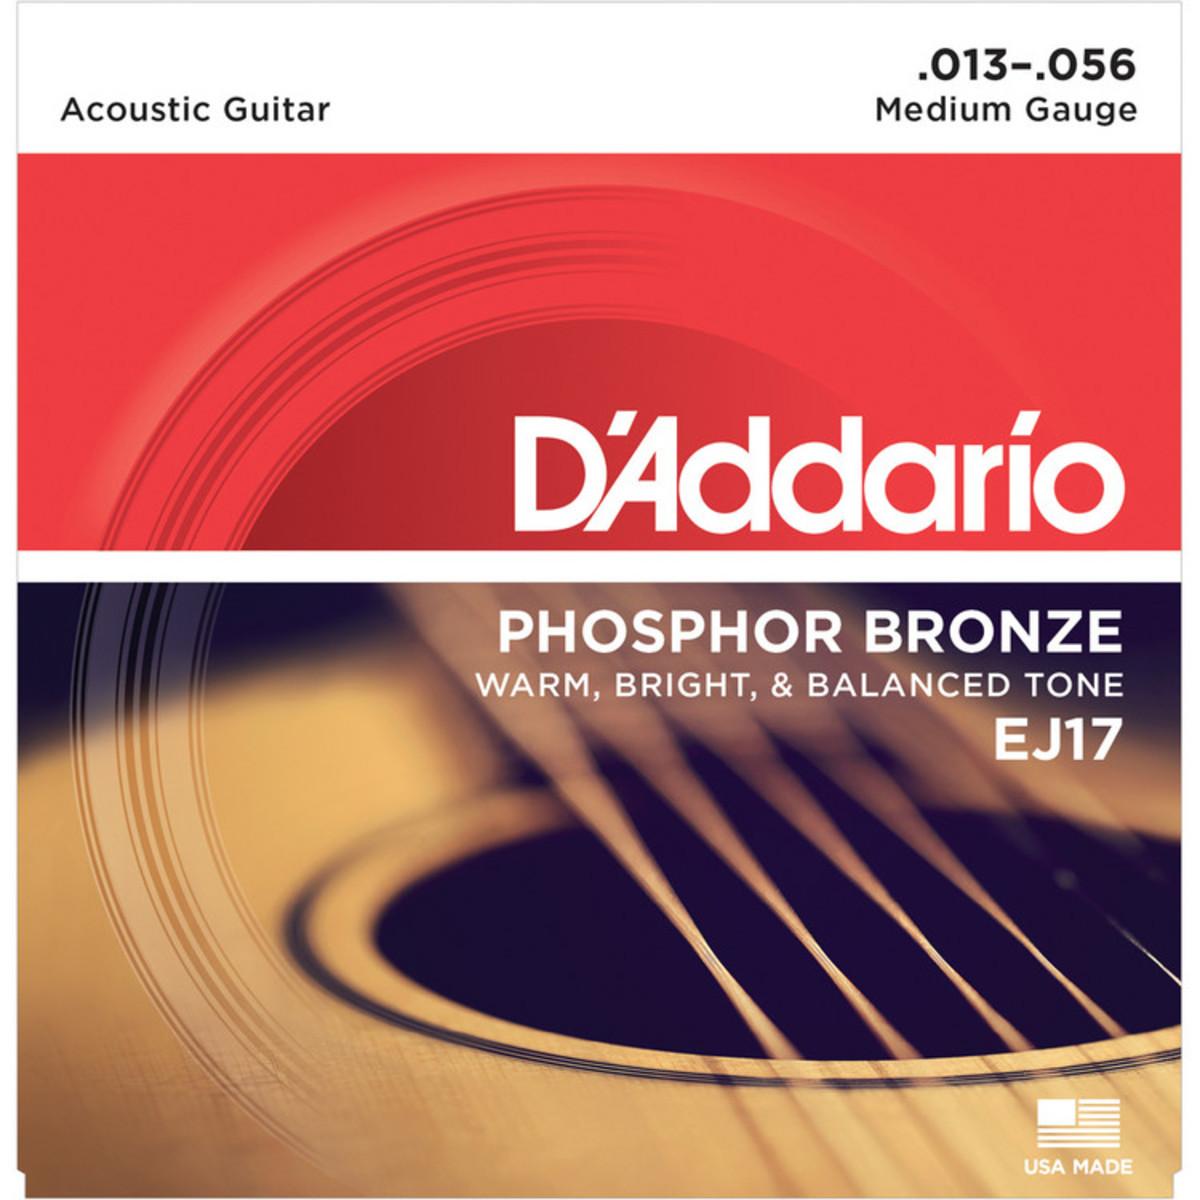 D'Addario EJ17 Phosphor Bronze Guitar Strings